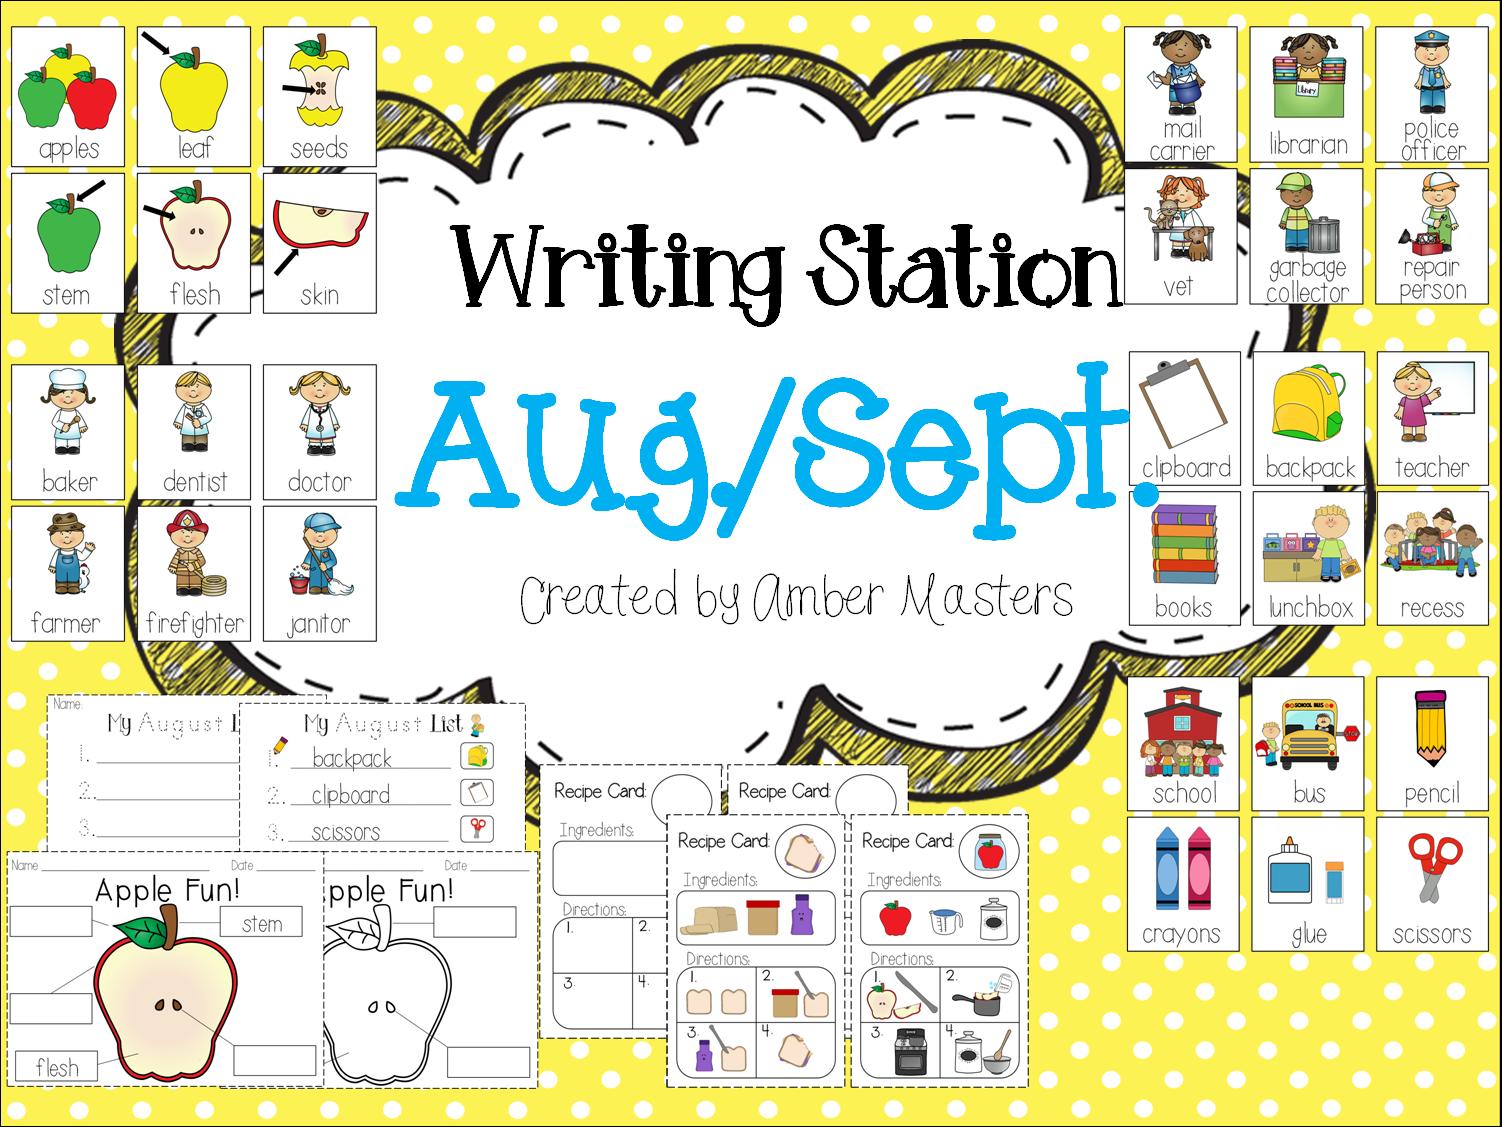 http://www.teacherspayteachers.com/Product/August-September-Writing-Station-1346988